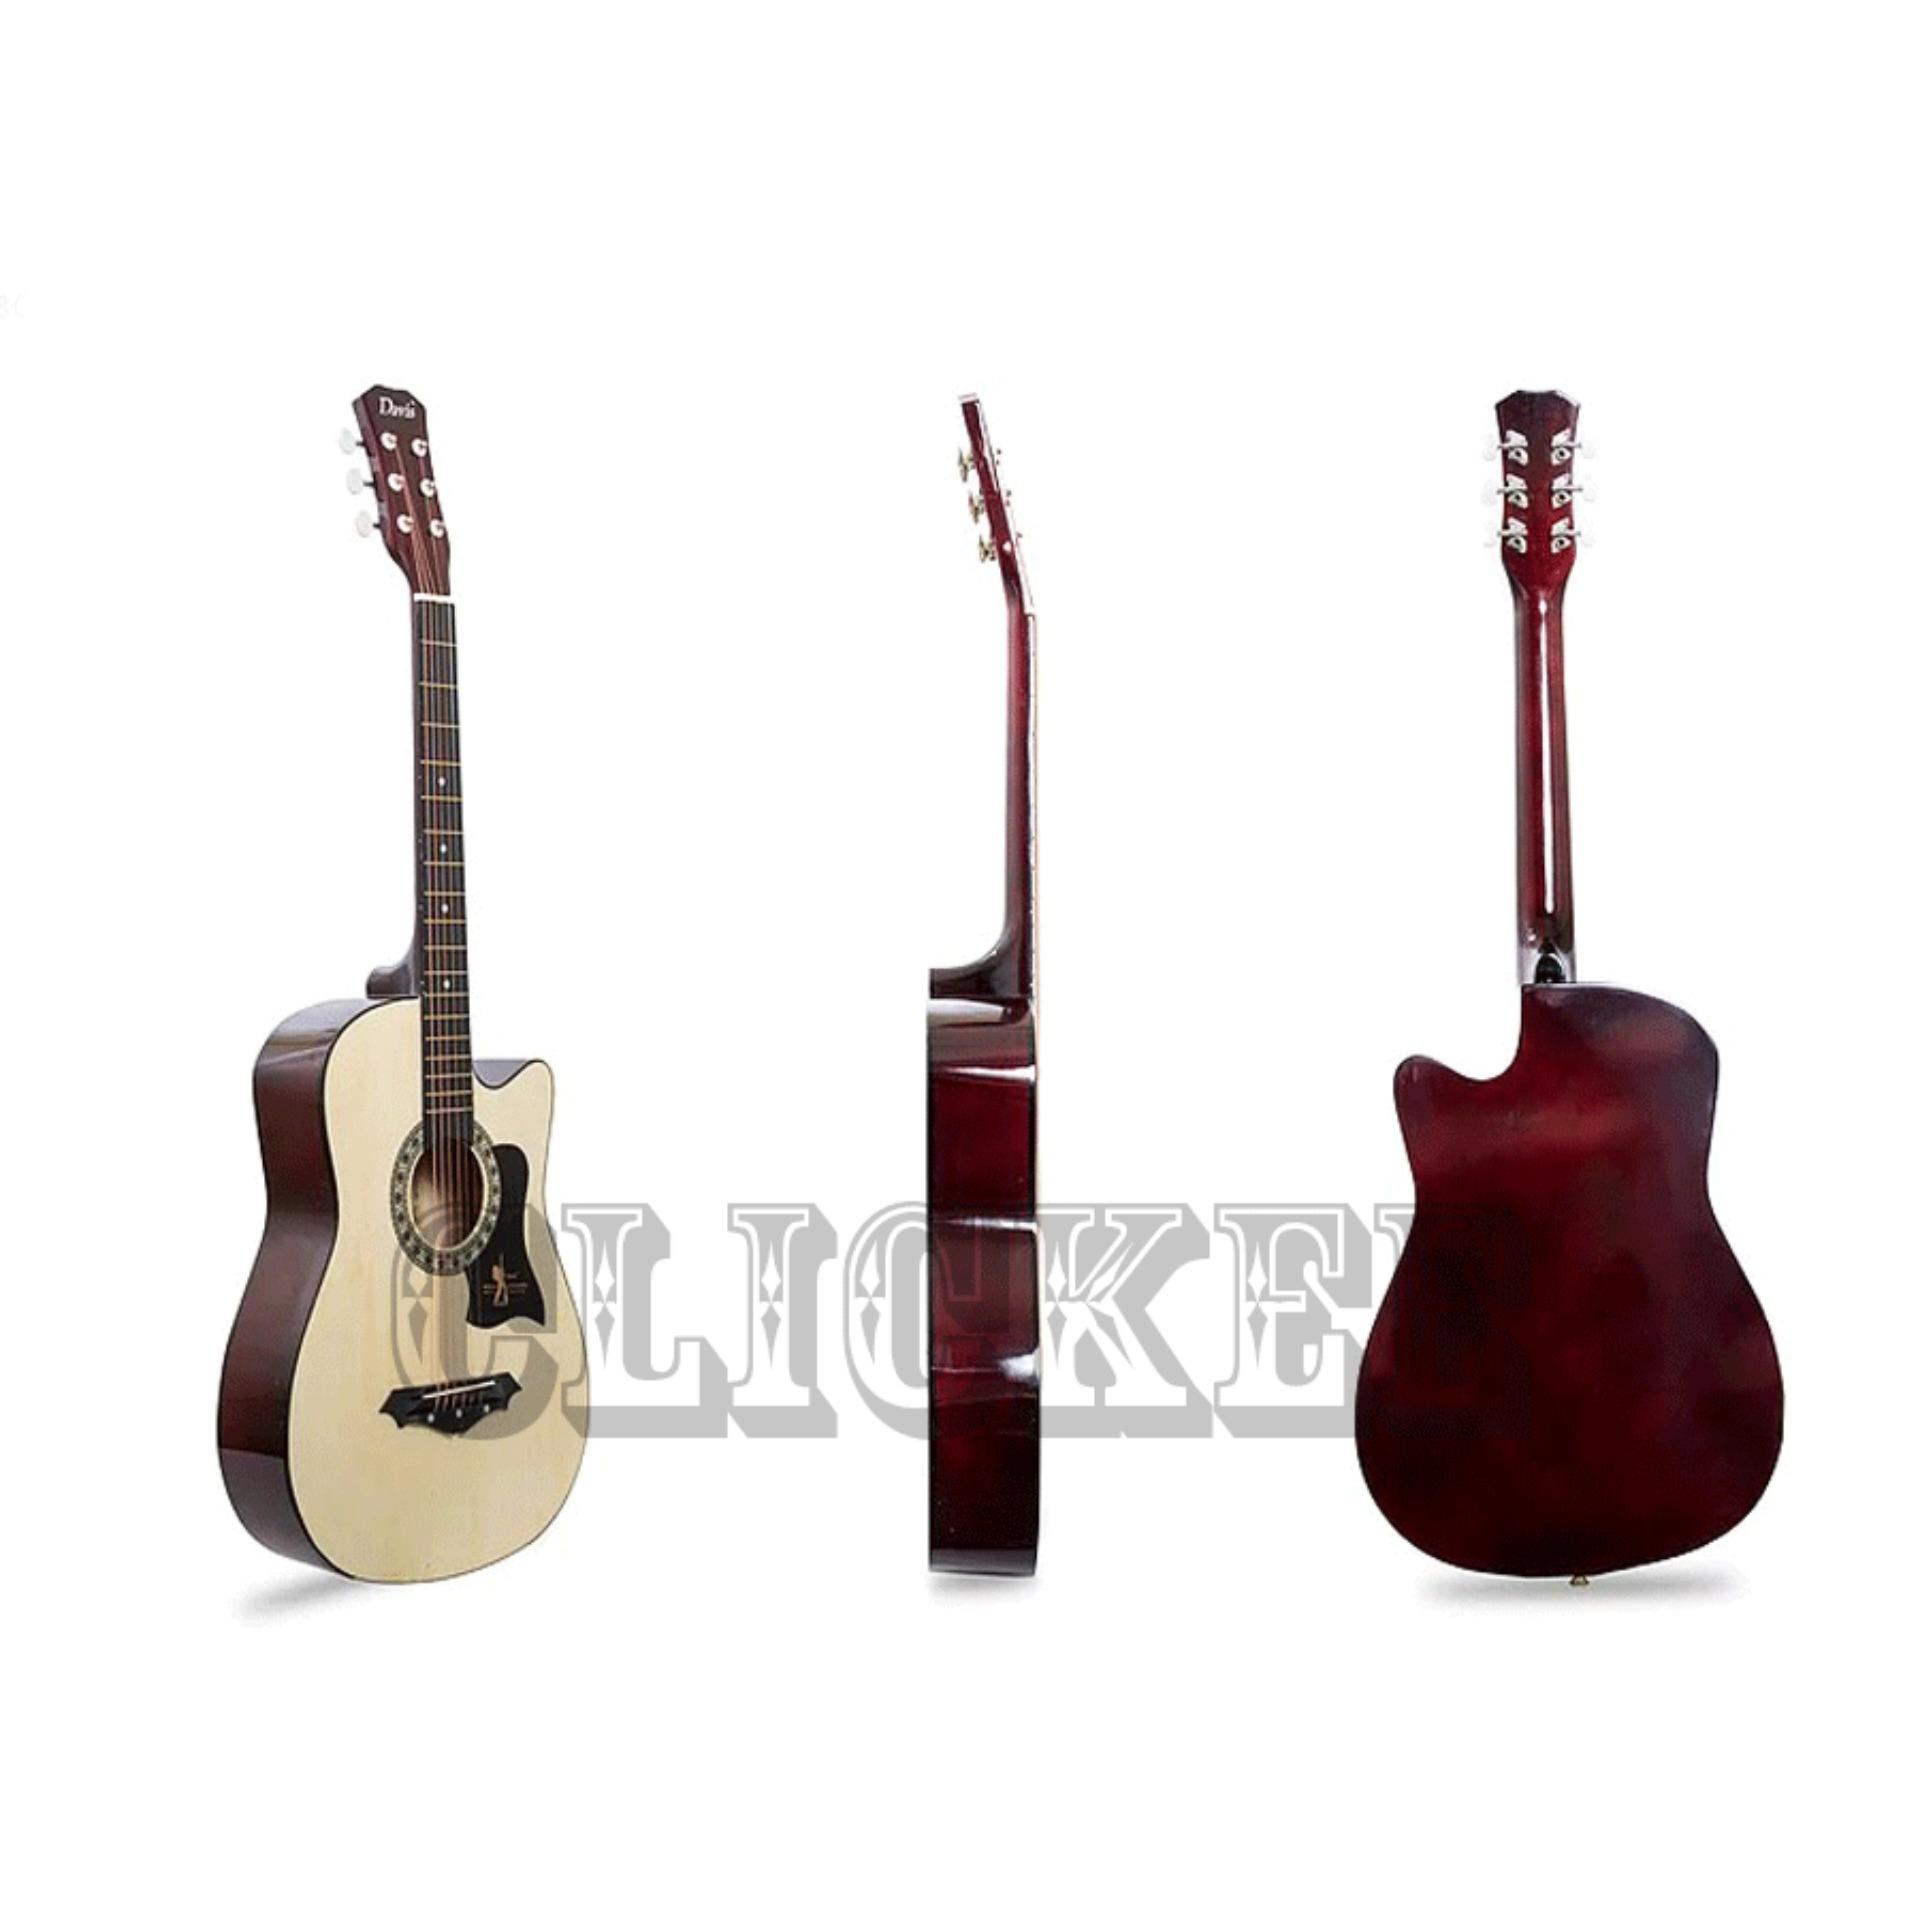 Philippines Davis Acoustic Guitar Jg 38 Best Deals Natural New Price